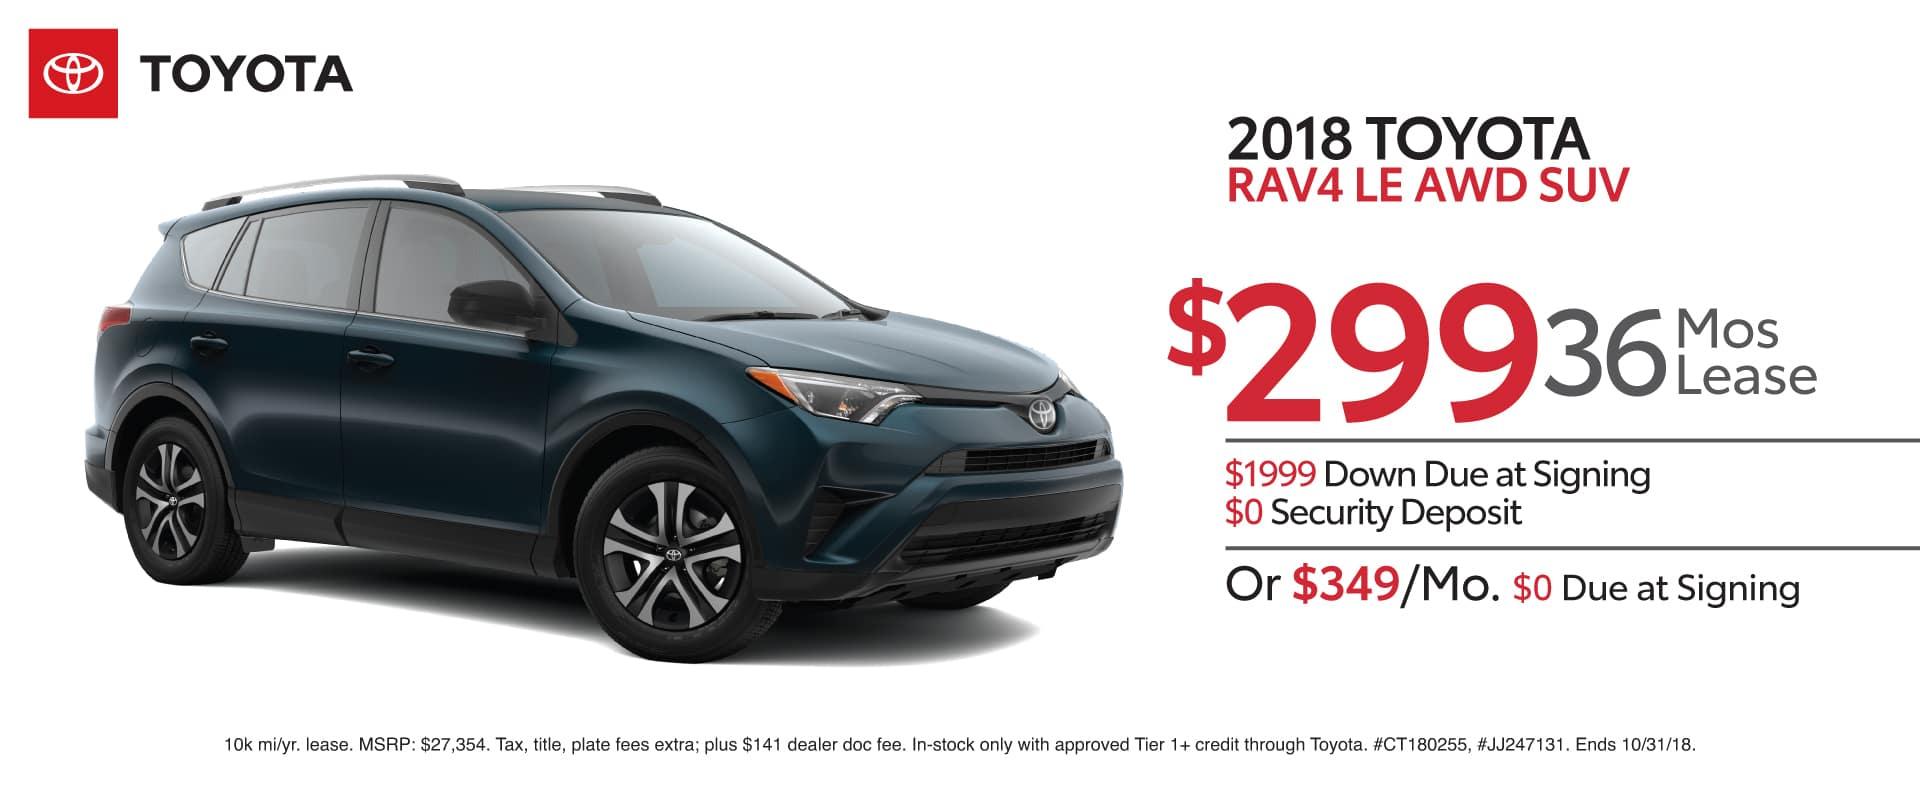 2018 Toyota